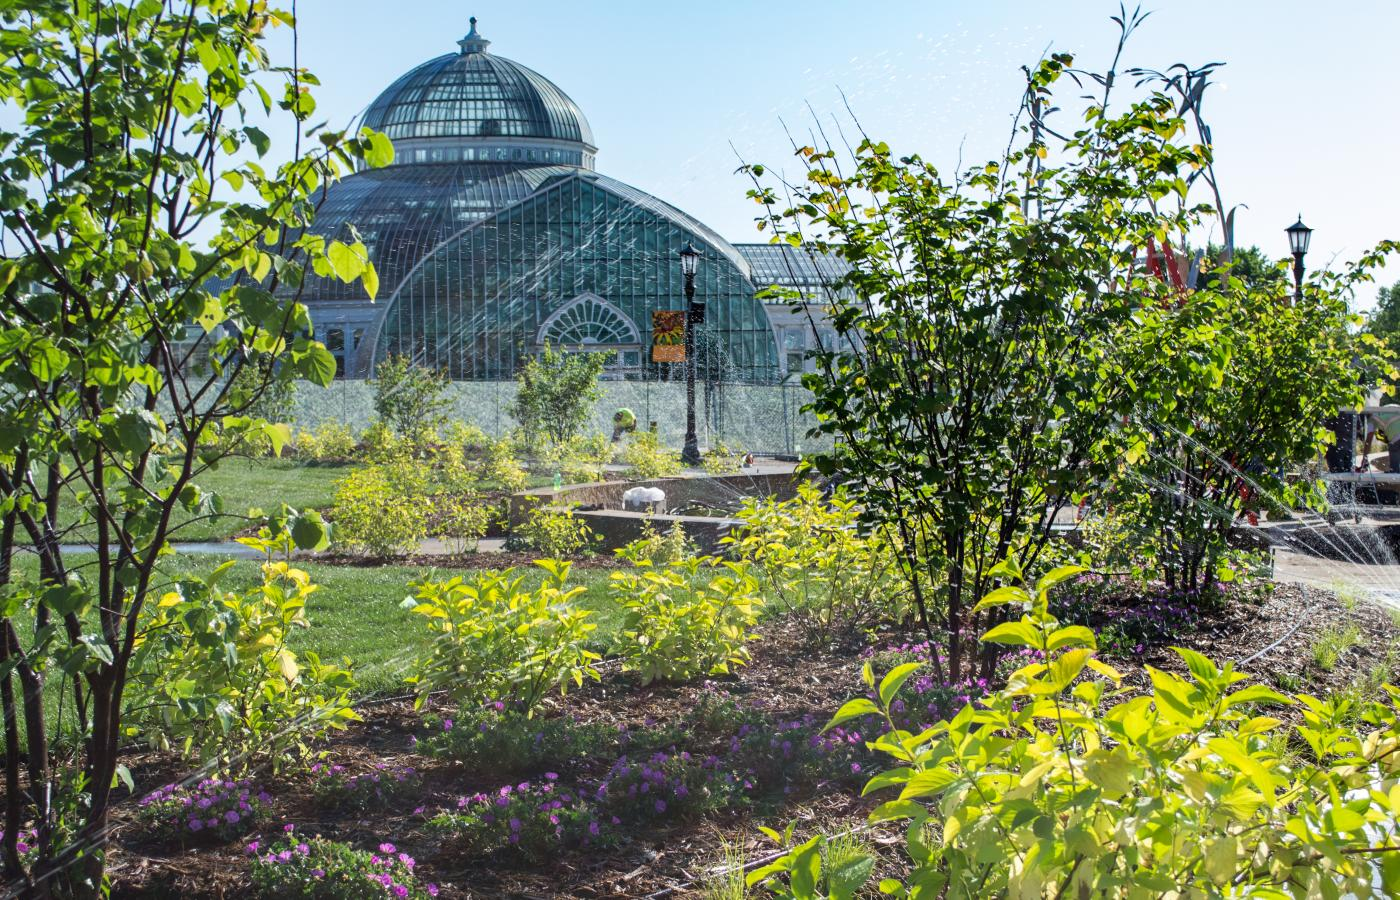 Minnesota Garden at Como Park - 8